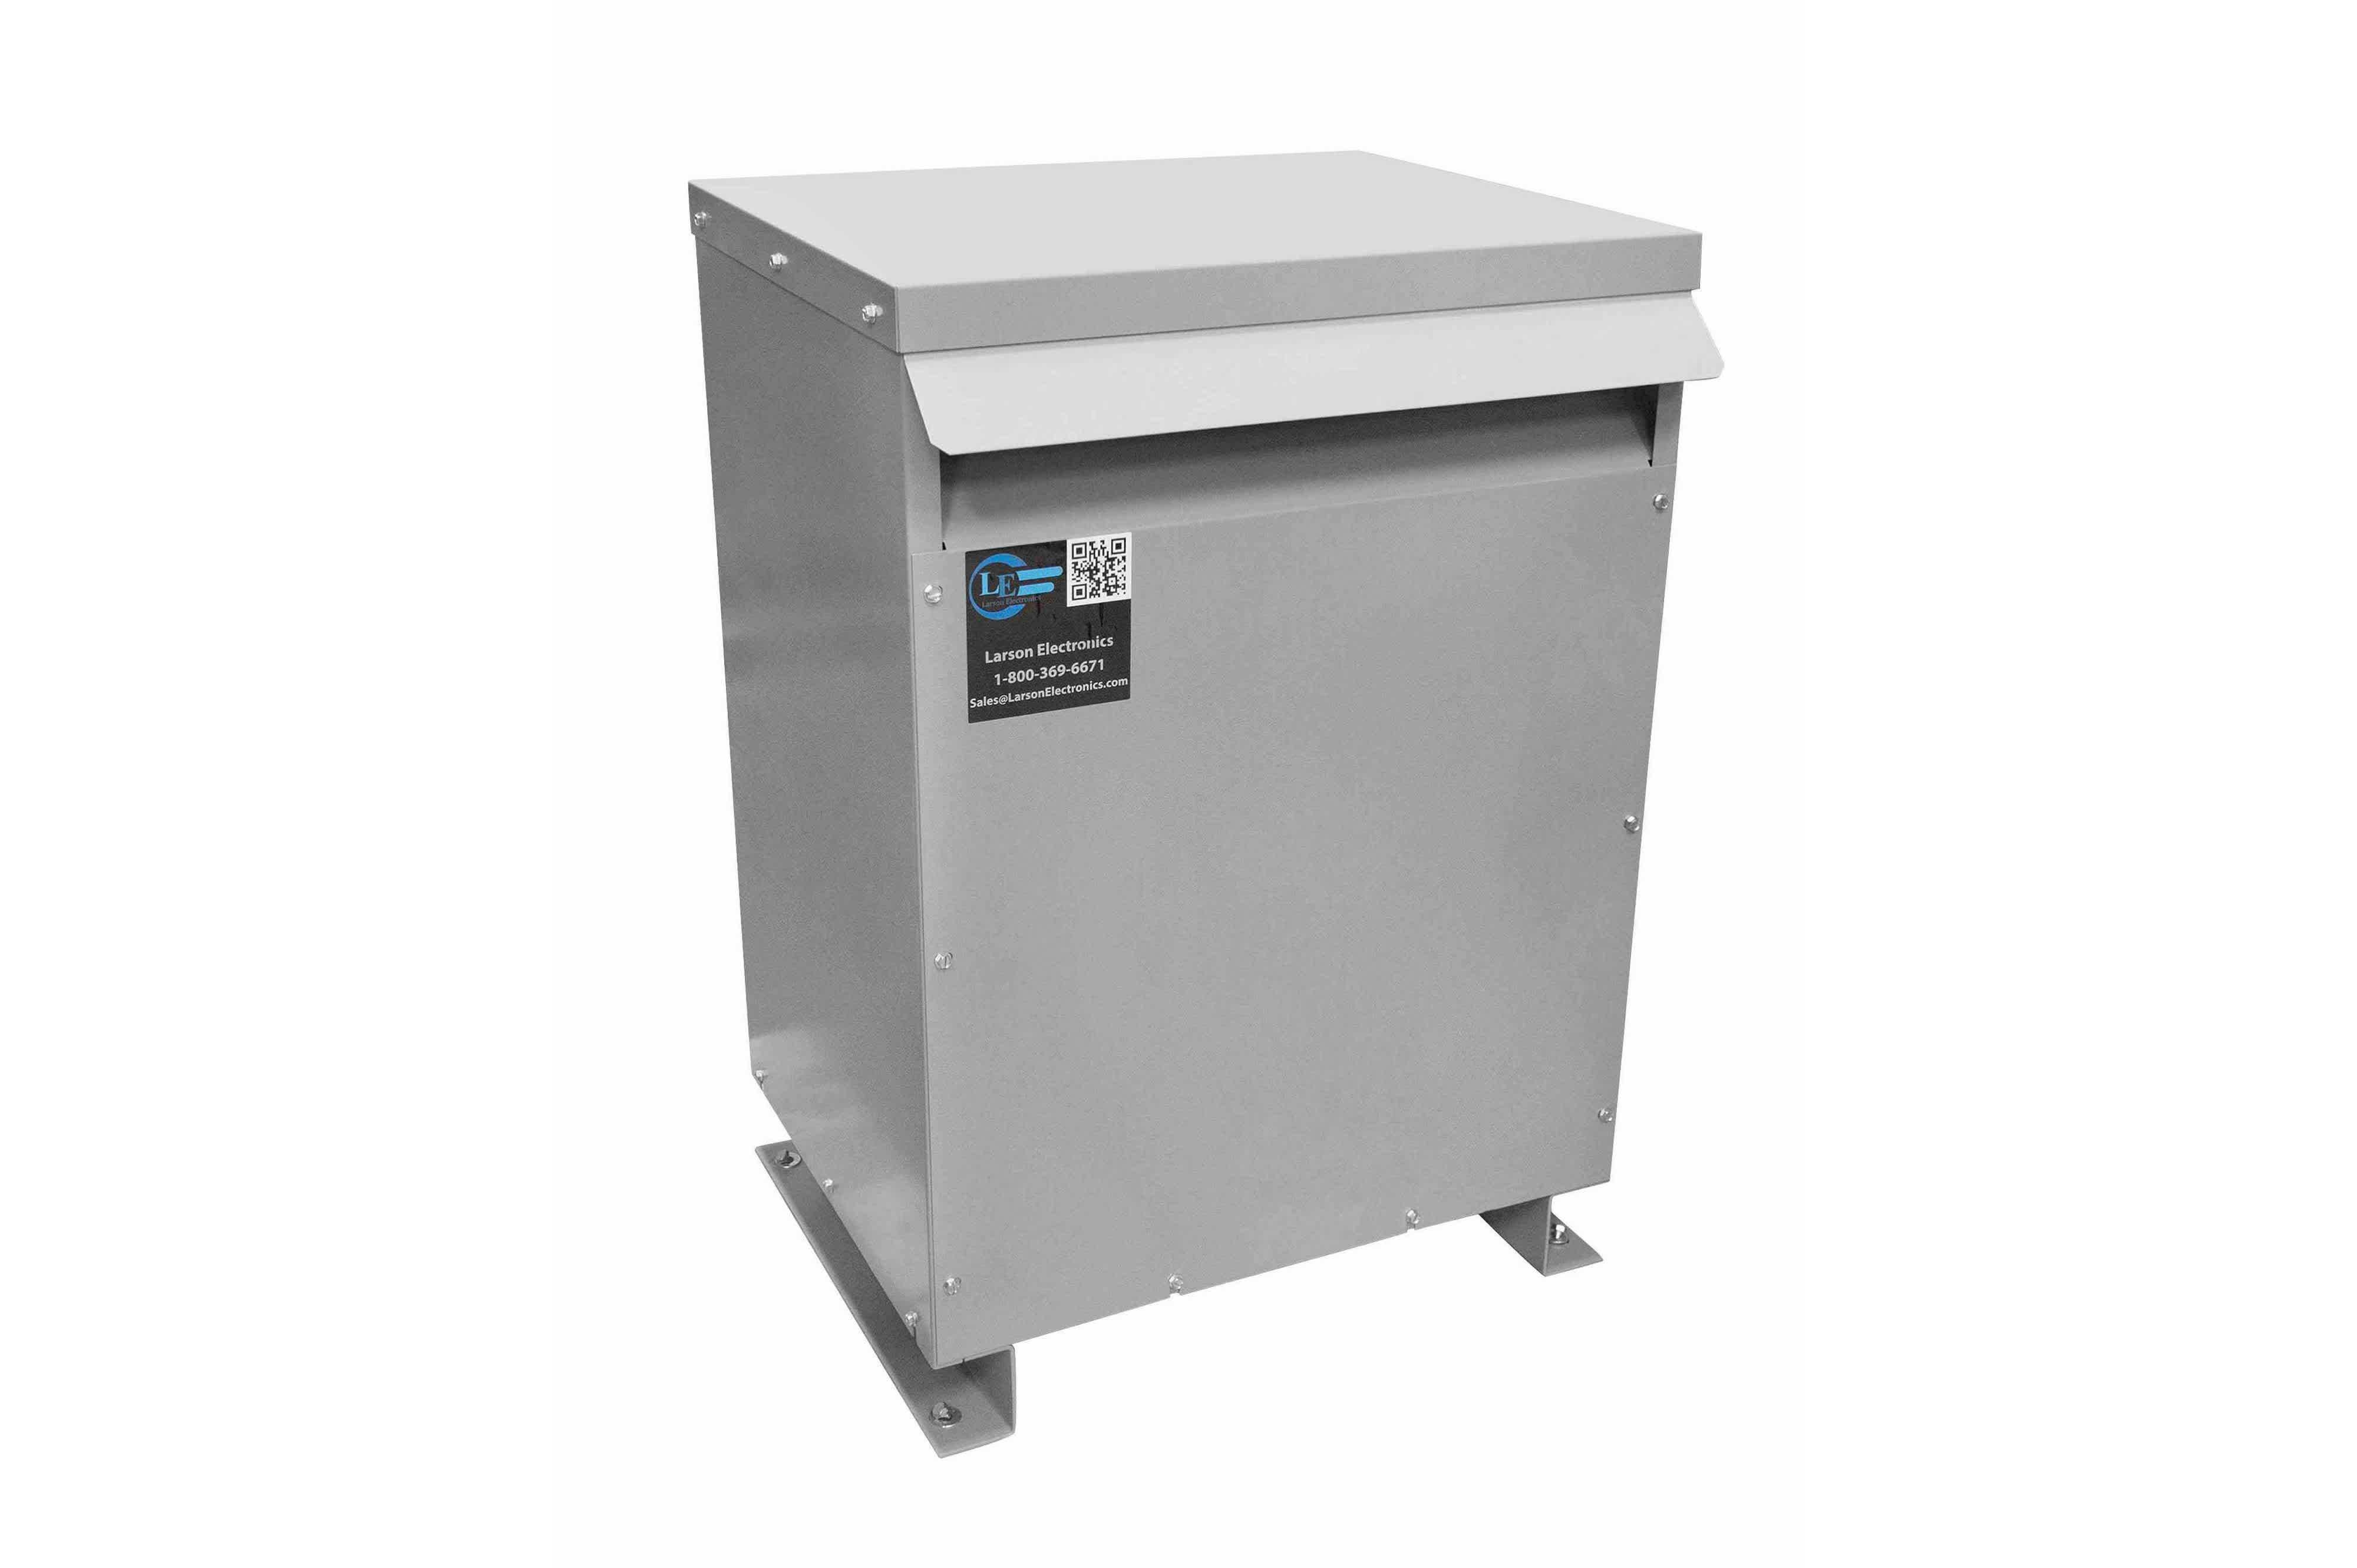 90 kVA 3PH Isolation Transformer, 240V Wye Primary, 400Y/231 Wye-N Secondary, N3R, Ventilated, 60 Hz